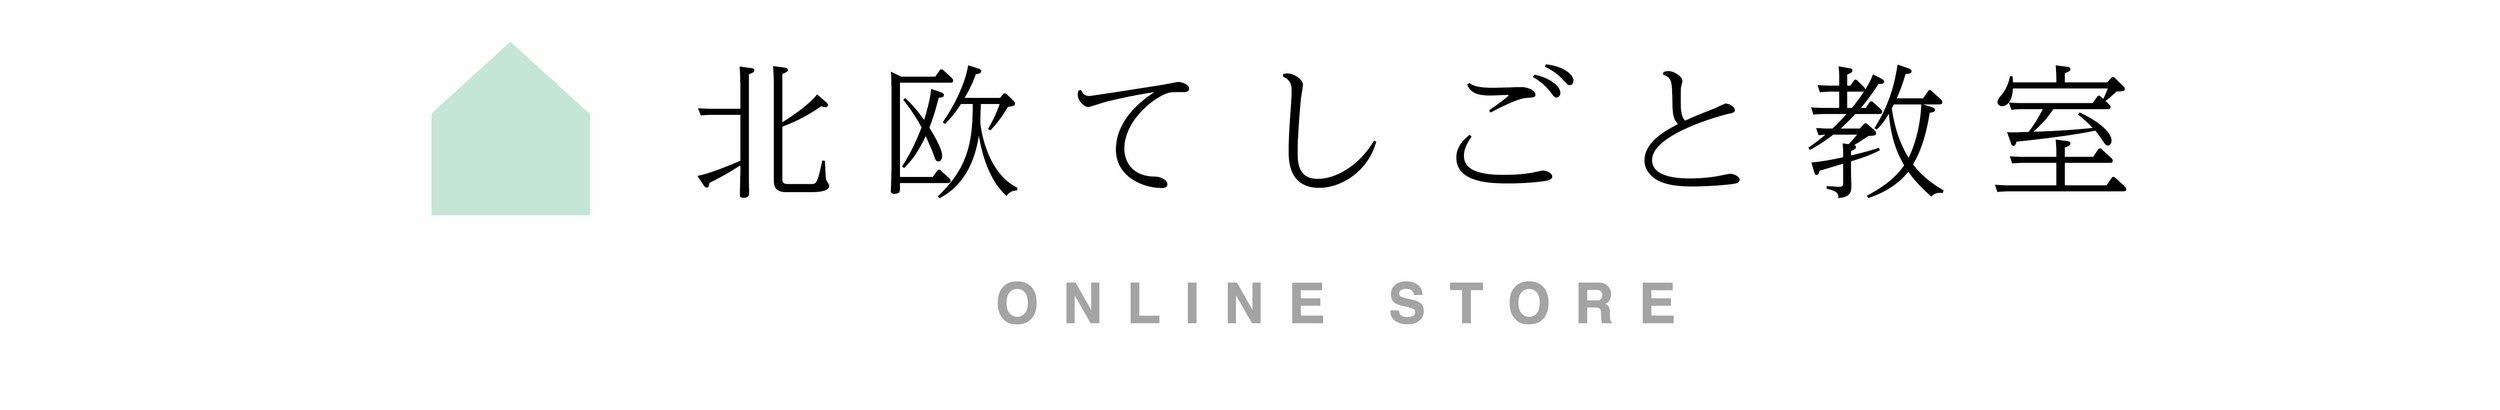 ECロゴ マーク(TOP利用中).jpg